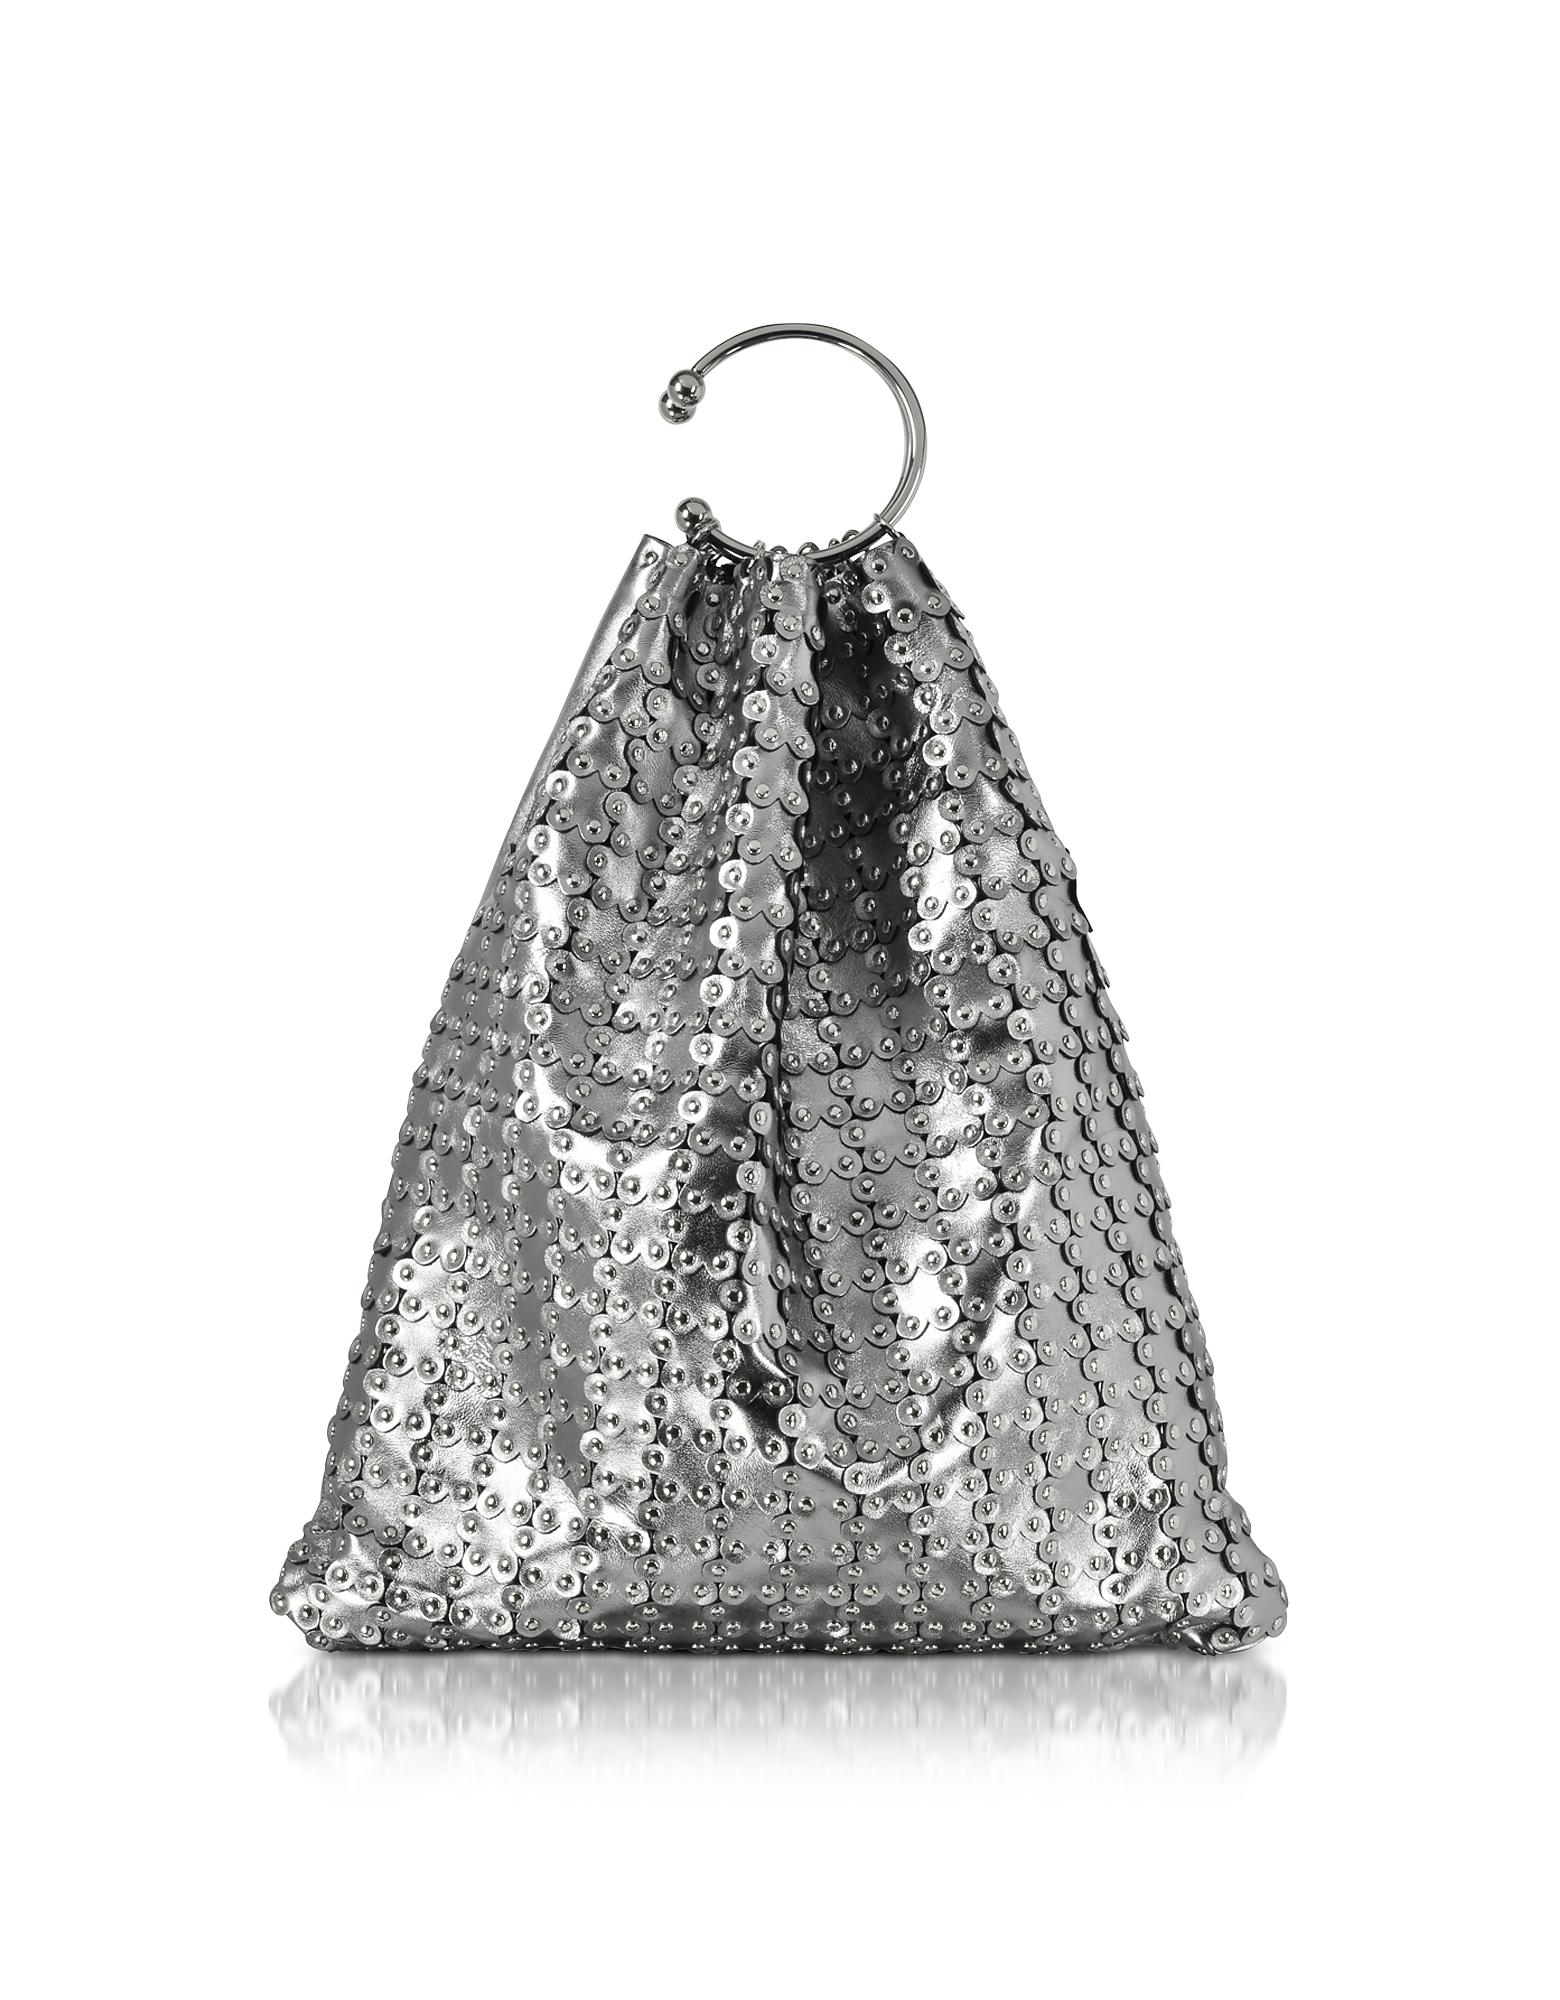 RED Valentino Handbags, Platinum Studded Metallic Leather Clutch